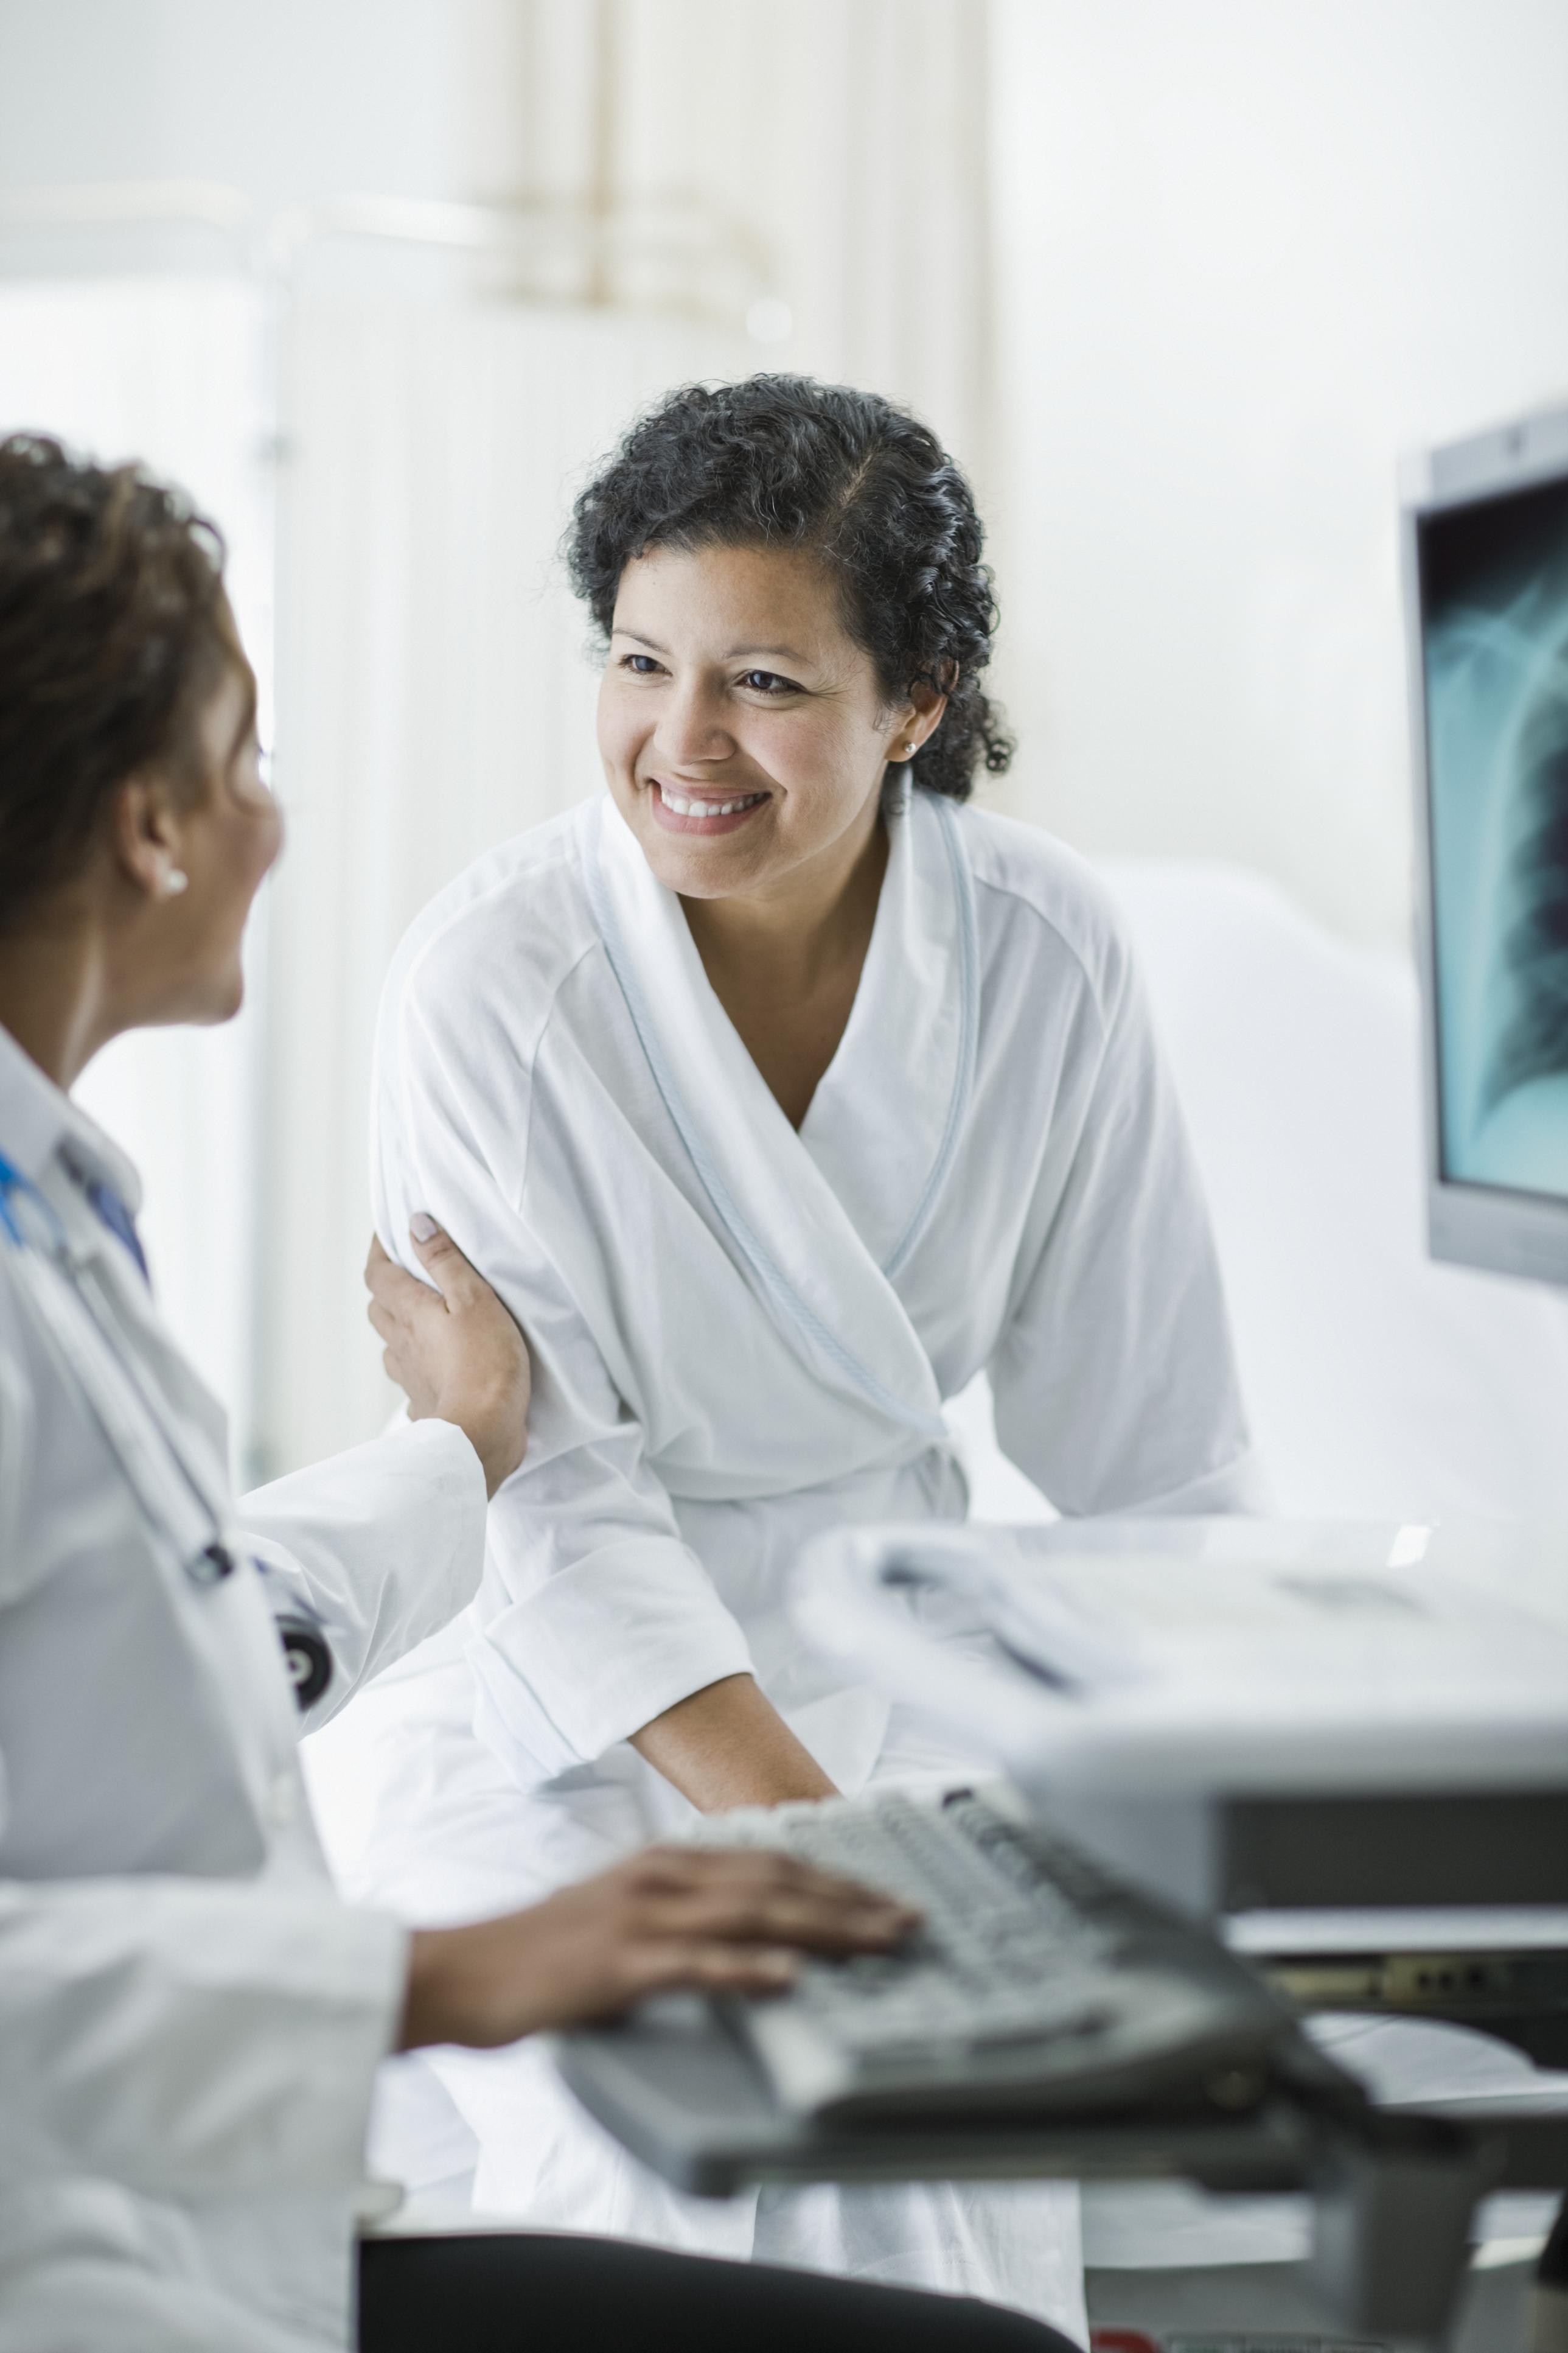 Medical Professional Assisting Patient